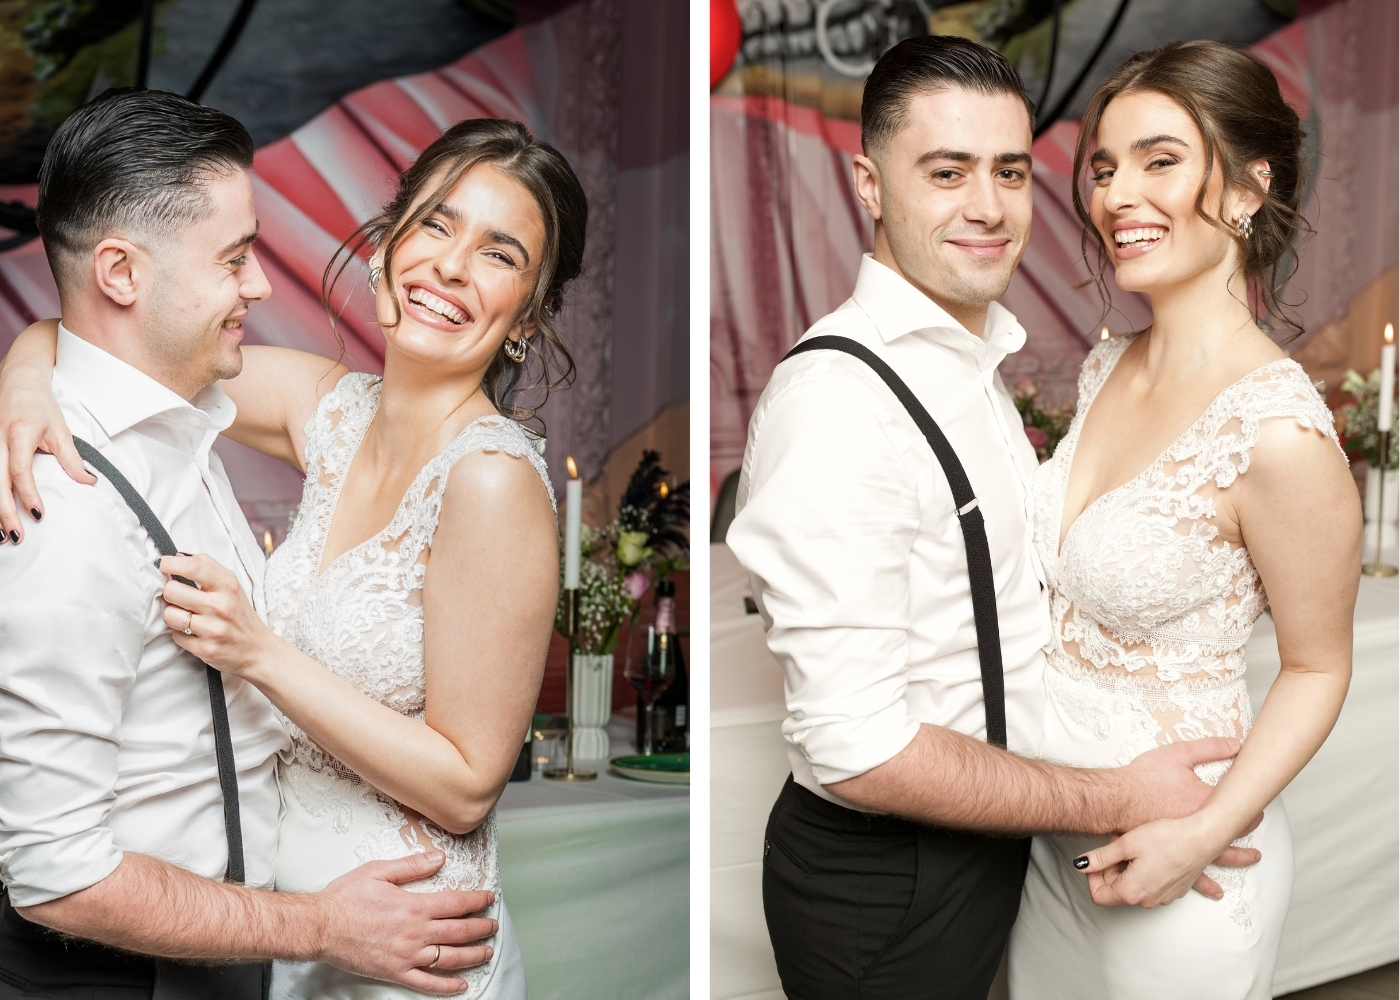 micro wedding trend adore justin alexander 14